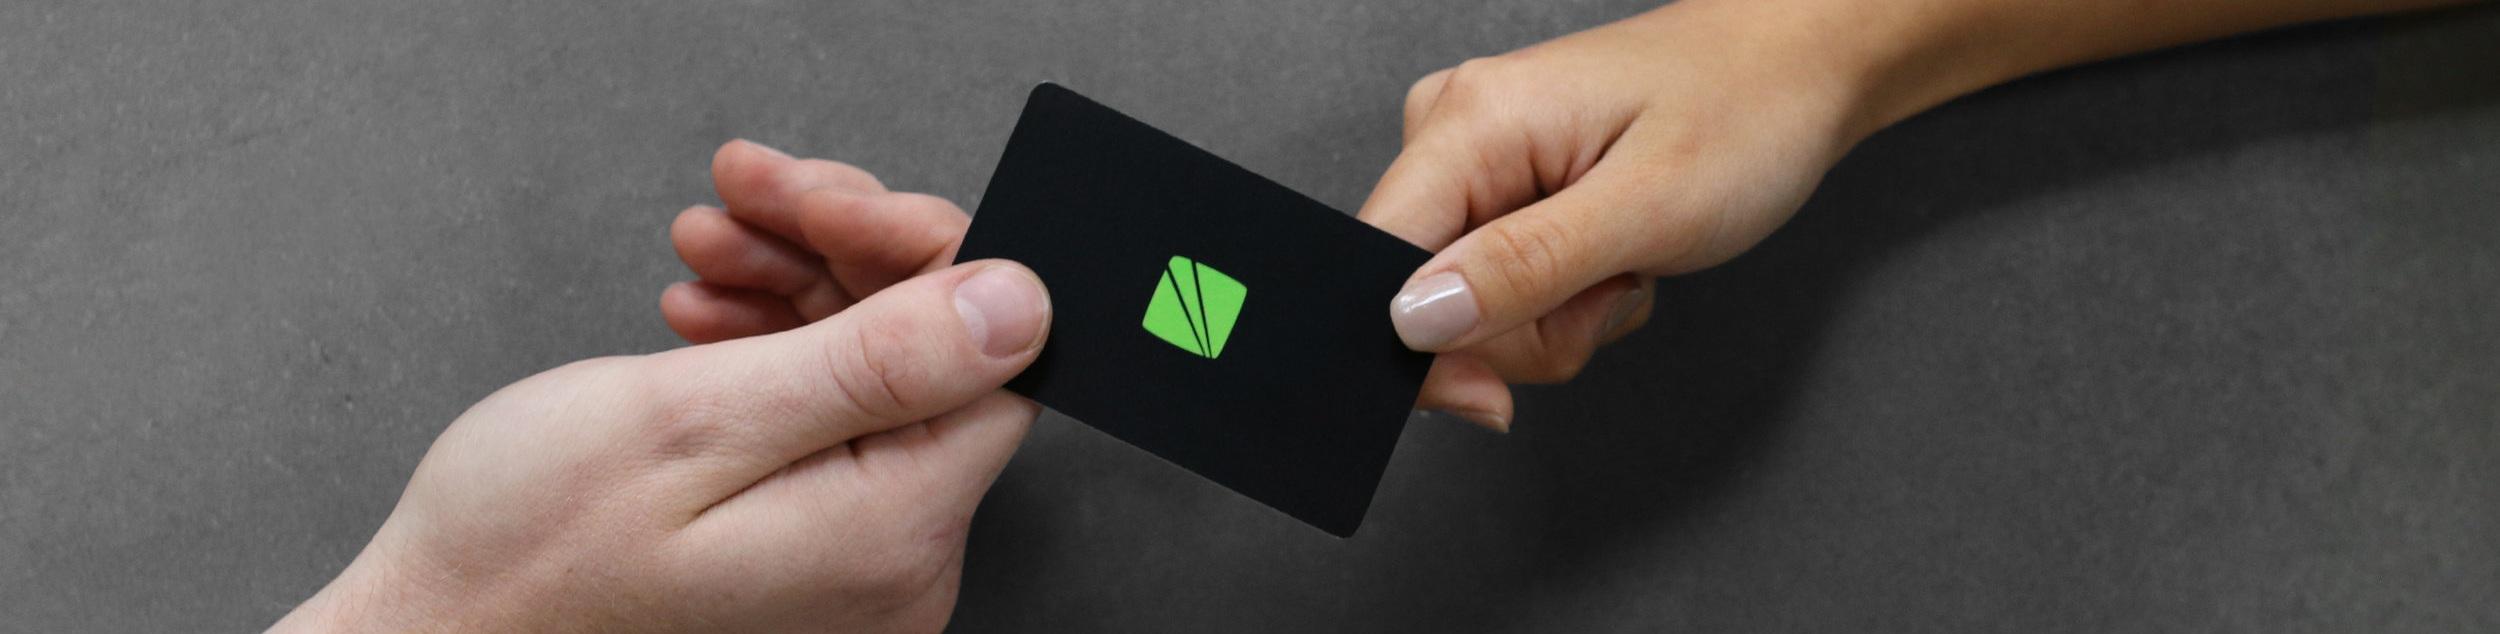 hands passing fusian card